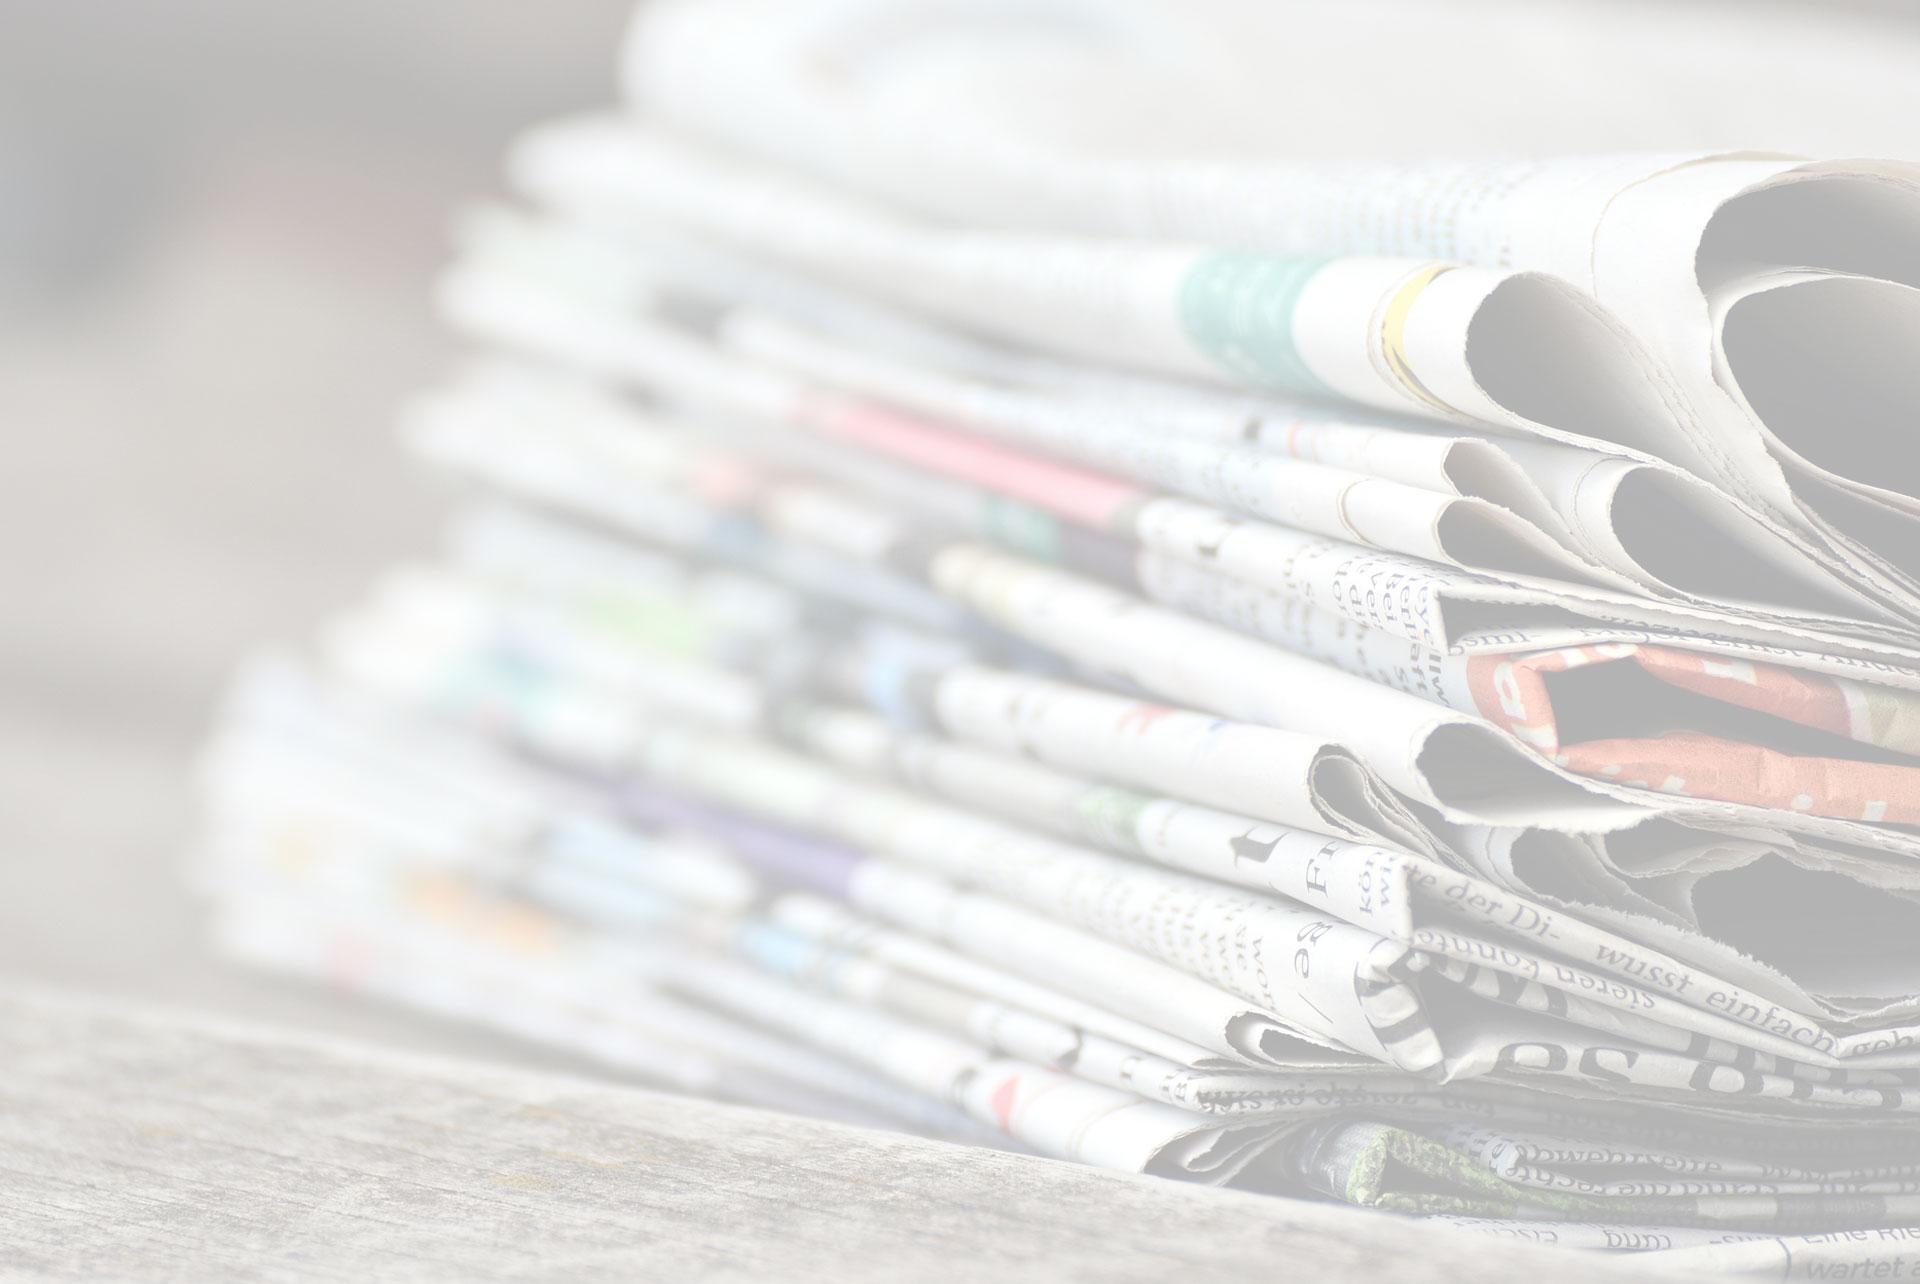 Maratona Trieste